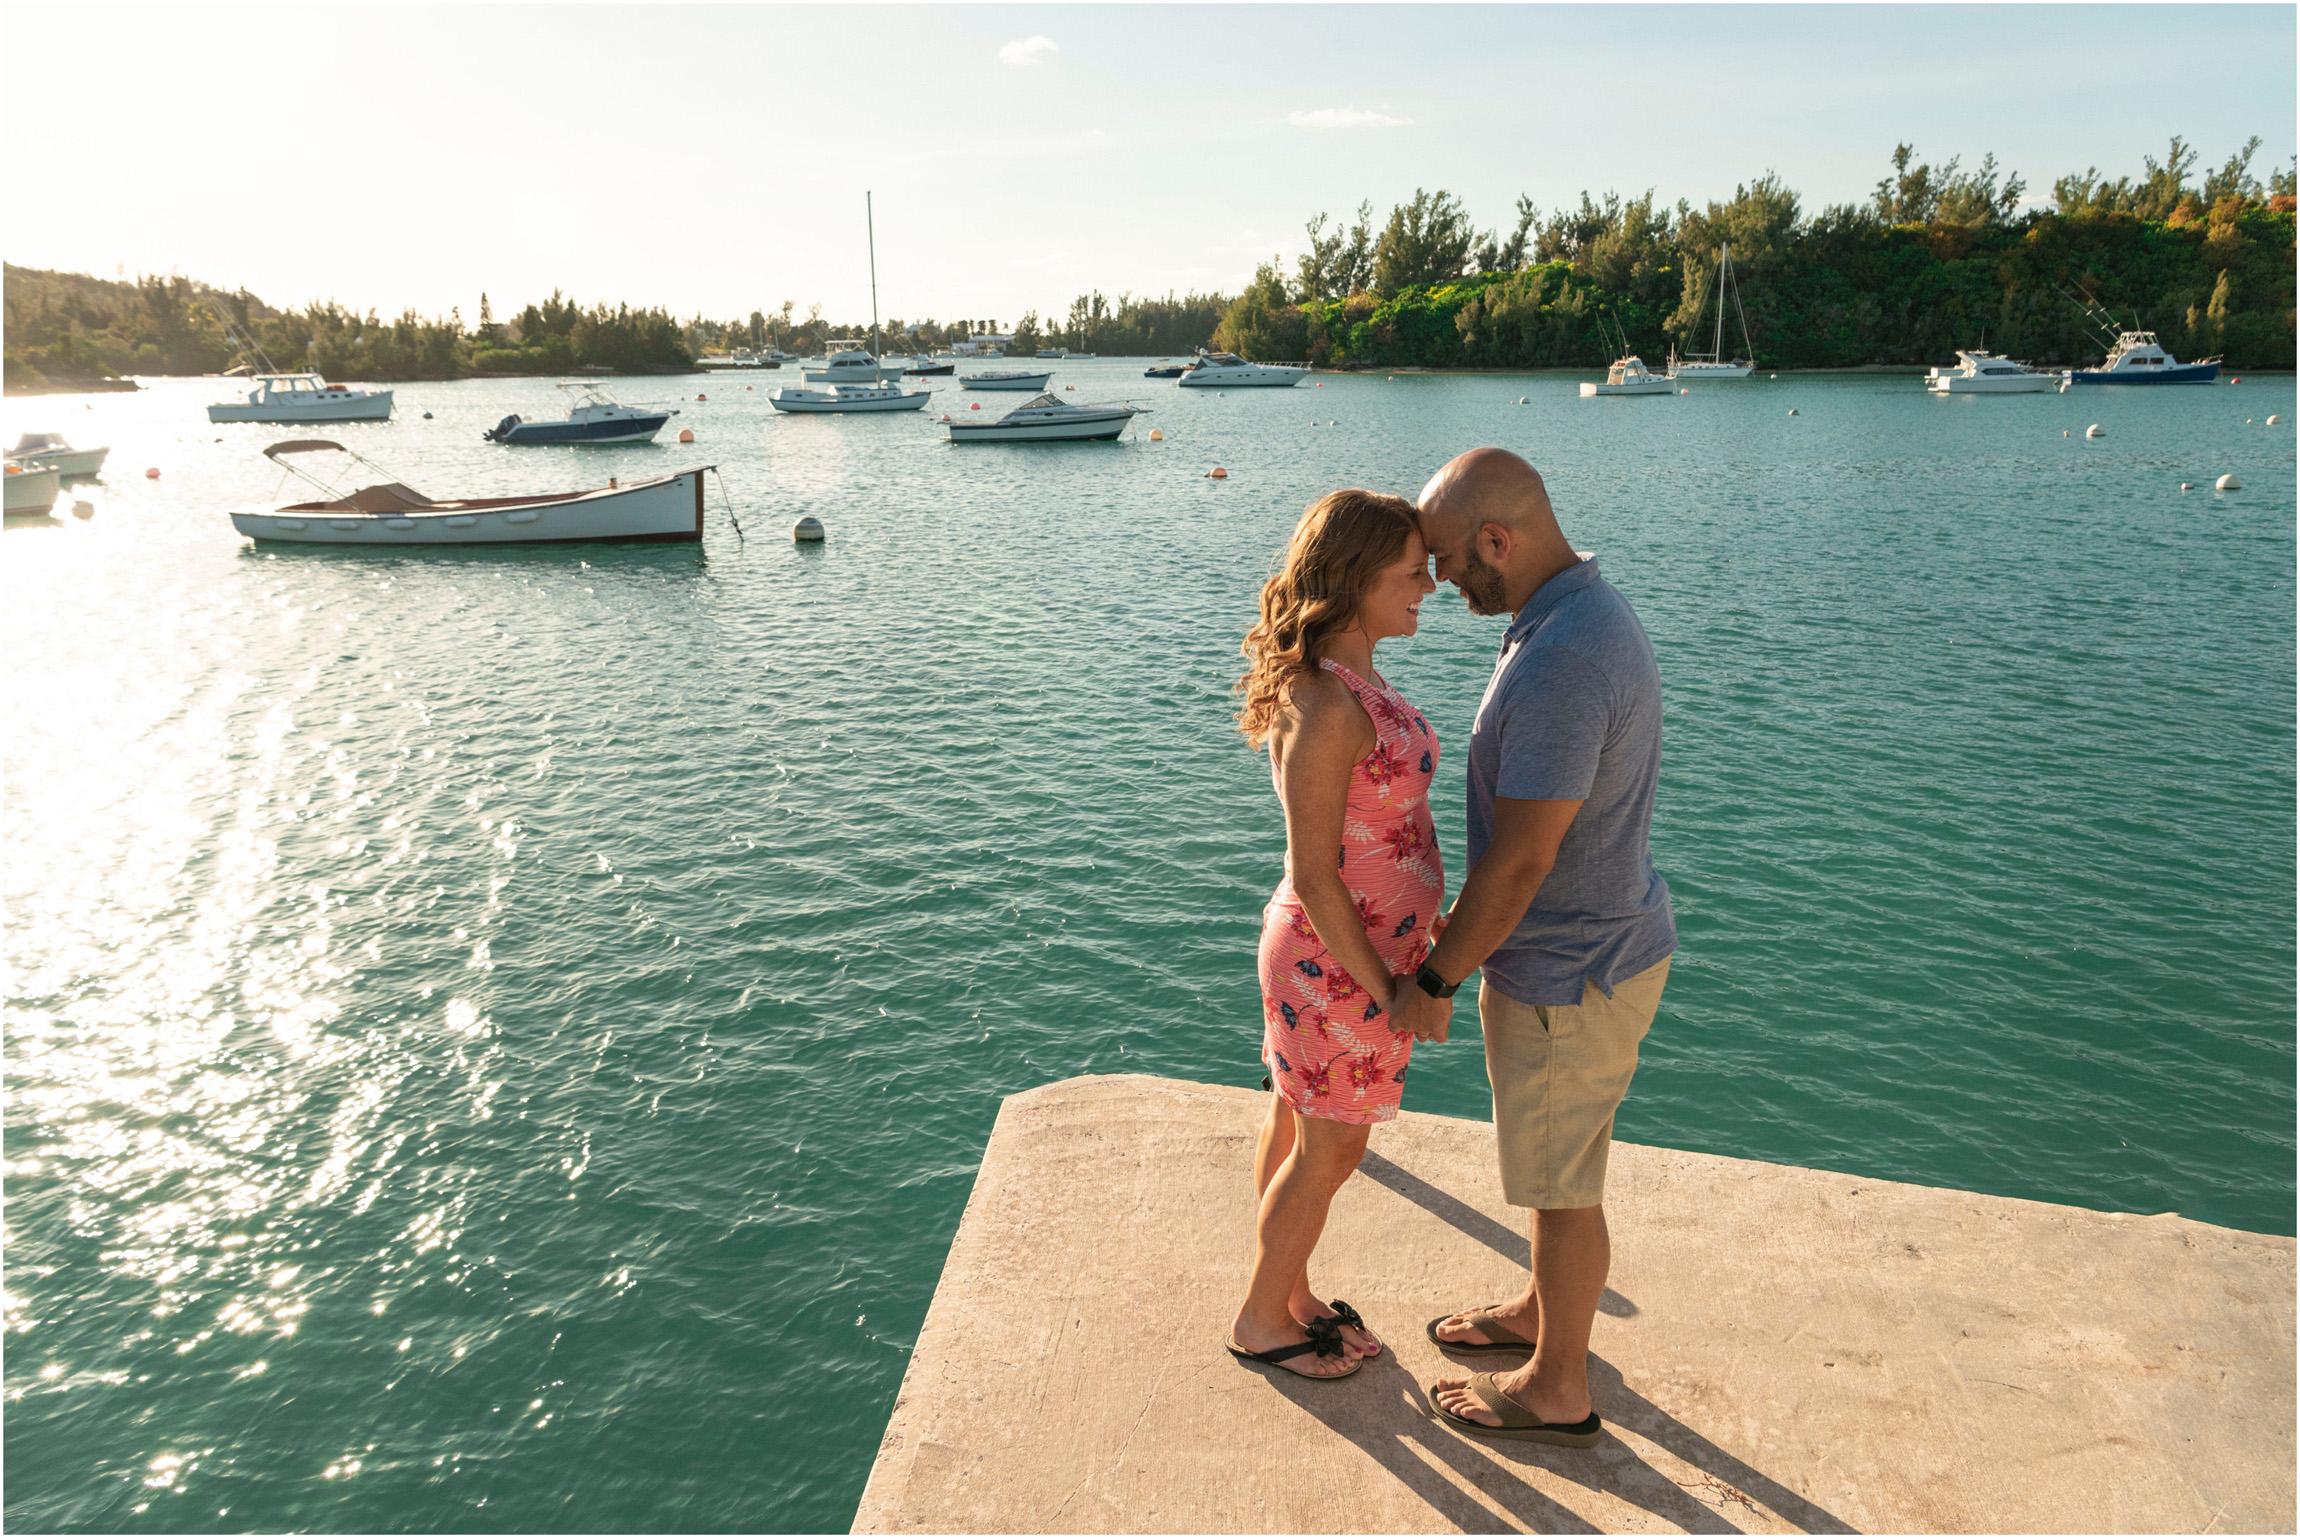 ©FianderFoto_Bermuda Maternity Photographer_Elys Harbour_Ft Scaur_Airbnb_Victoria_Mike_005.jpg